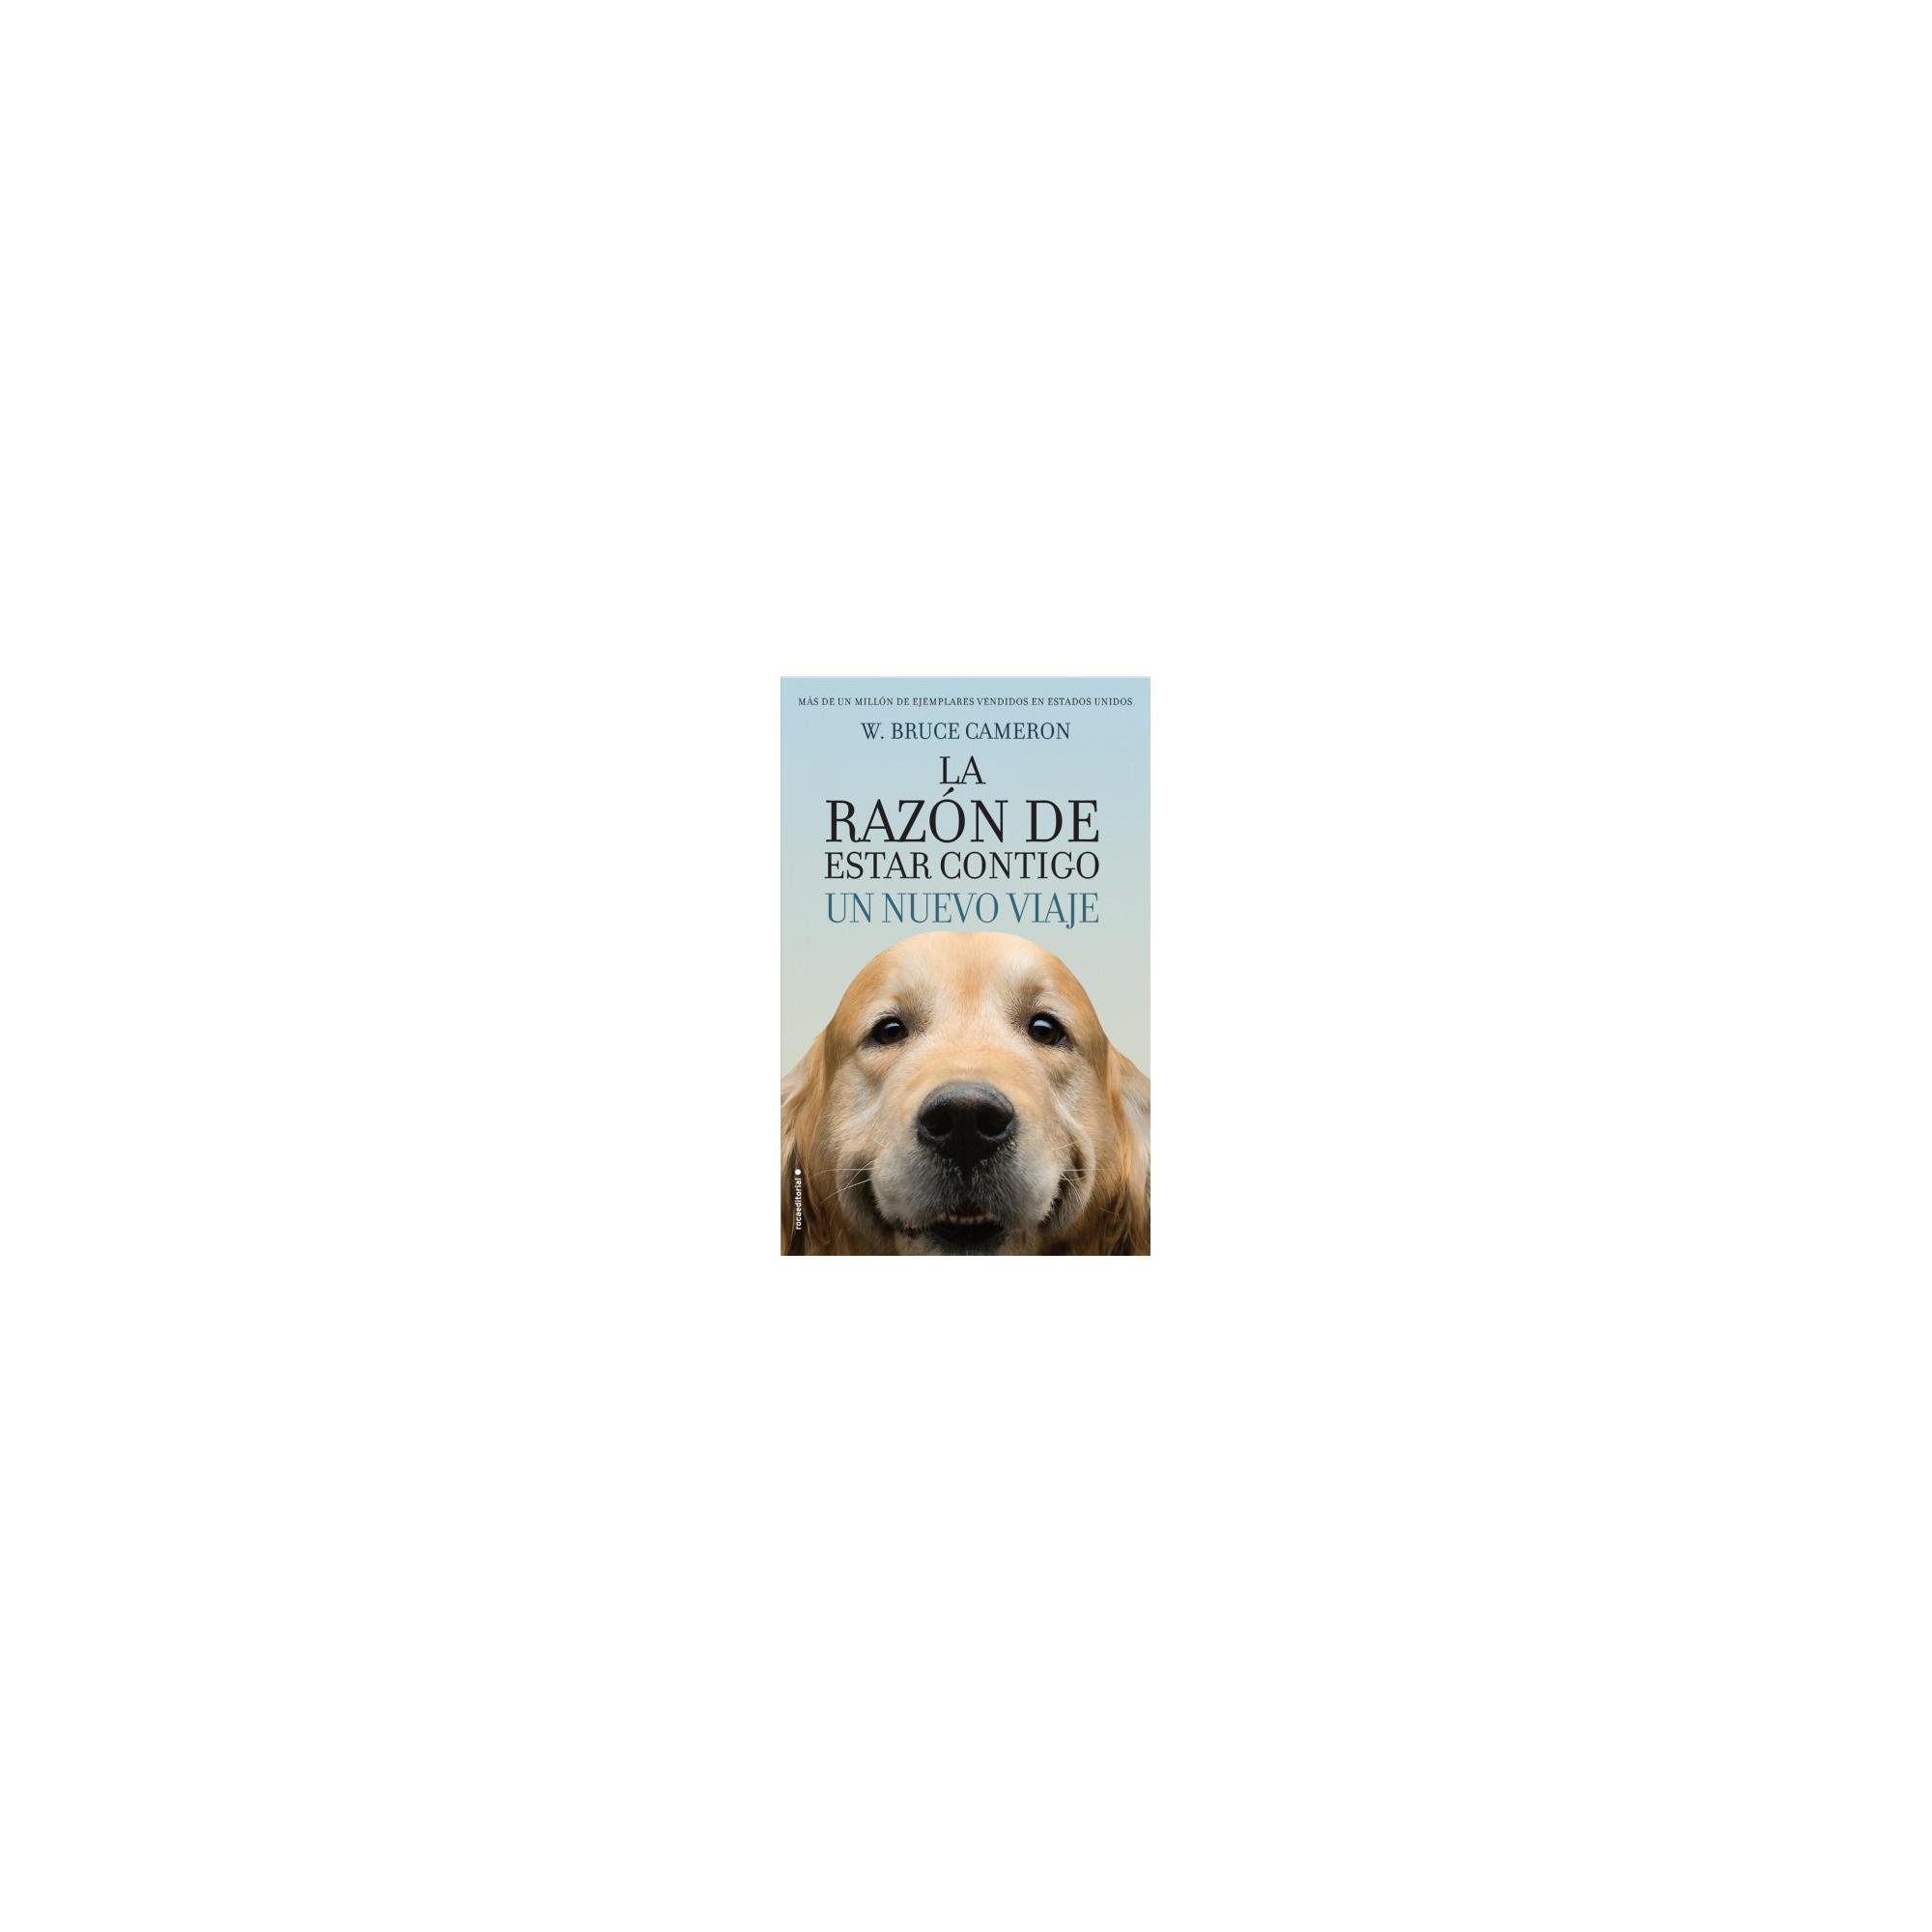 La razón de estar contigo / A Dog's Journey : Un nuevo viaje / Another Novel  for Humans (Paperback)